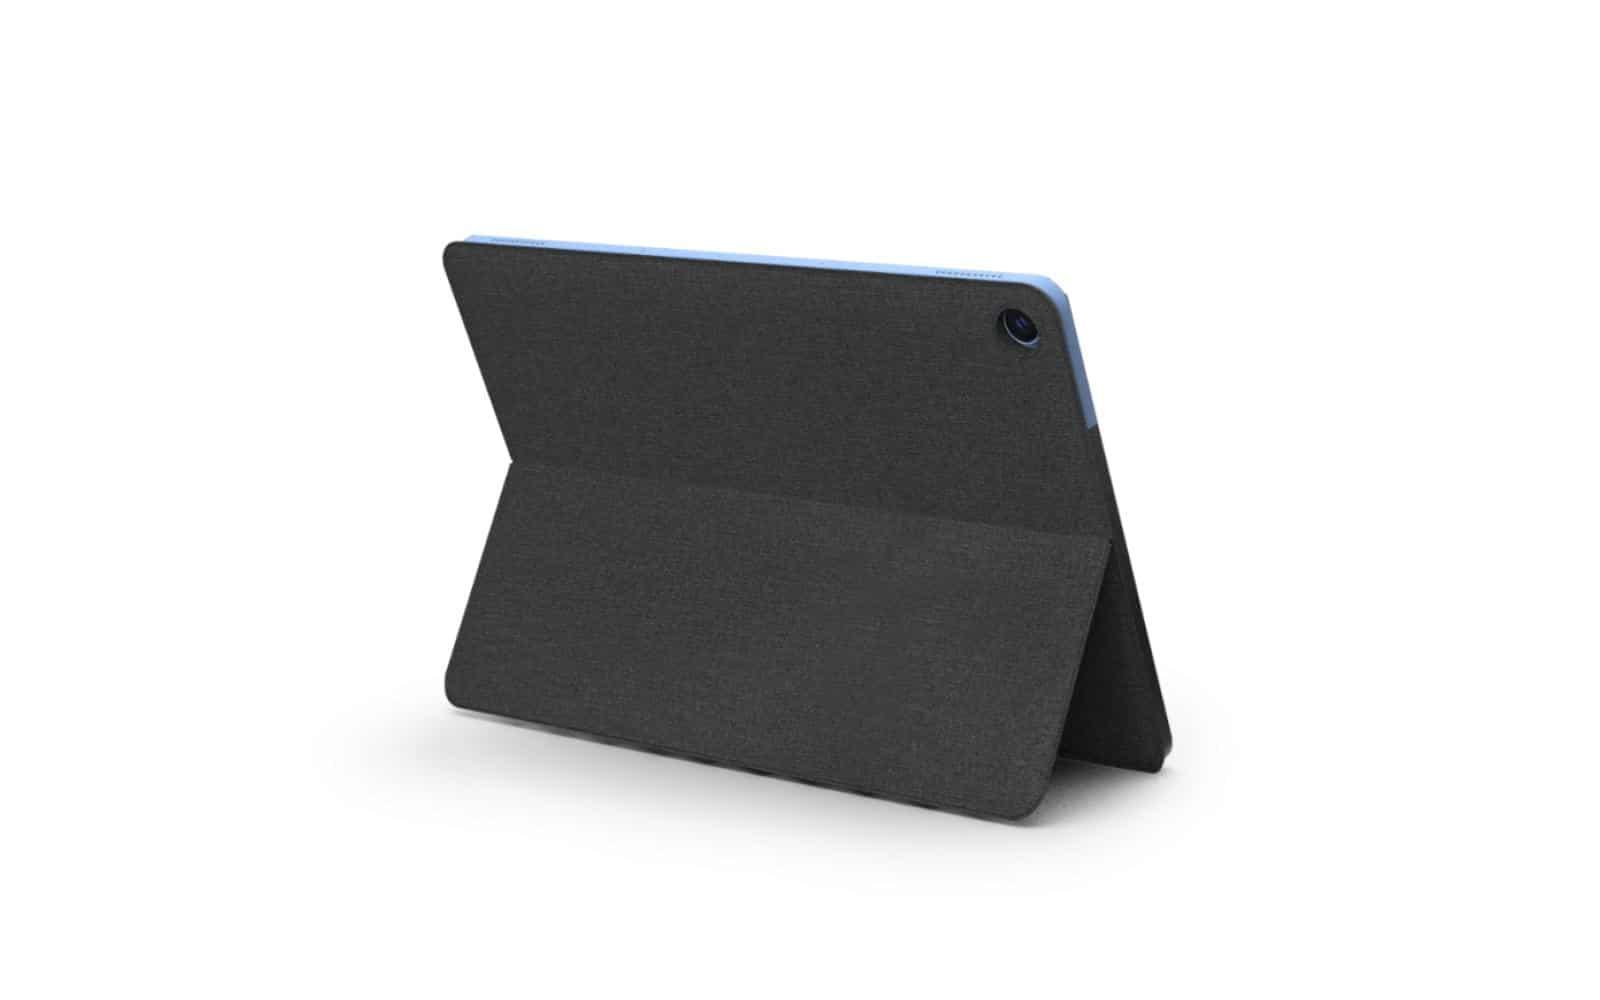 Lenovo IdeaPad Duet rear perspective biew